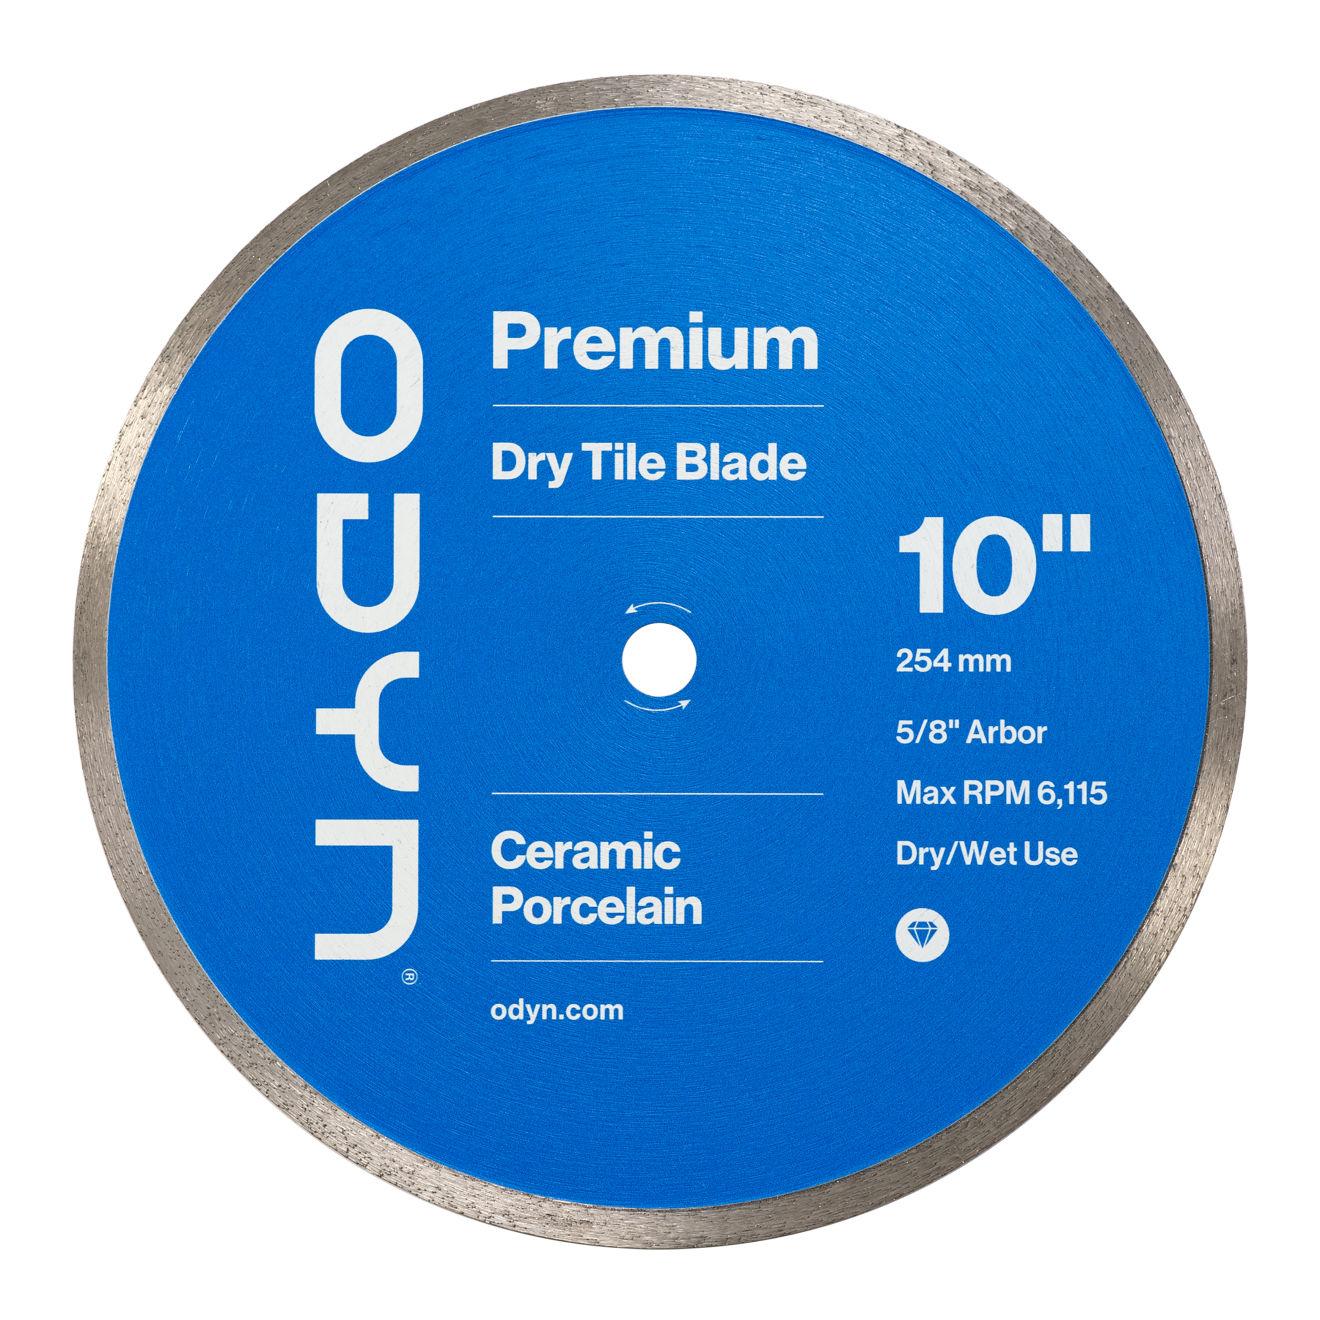 Odyn 10 in. Premium Dry Tile Blade